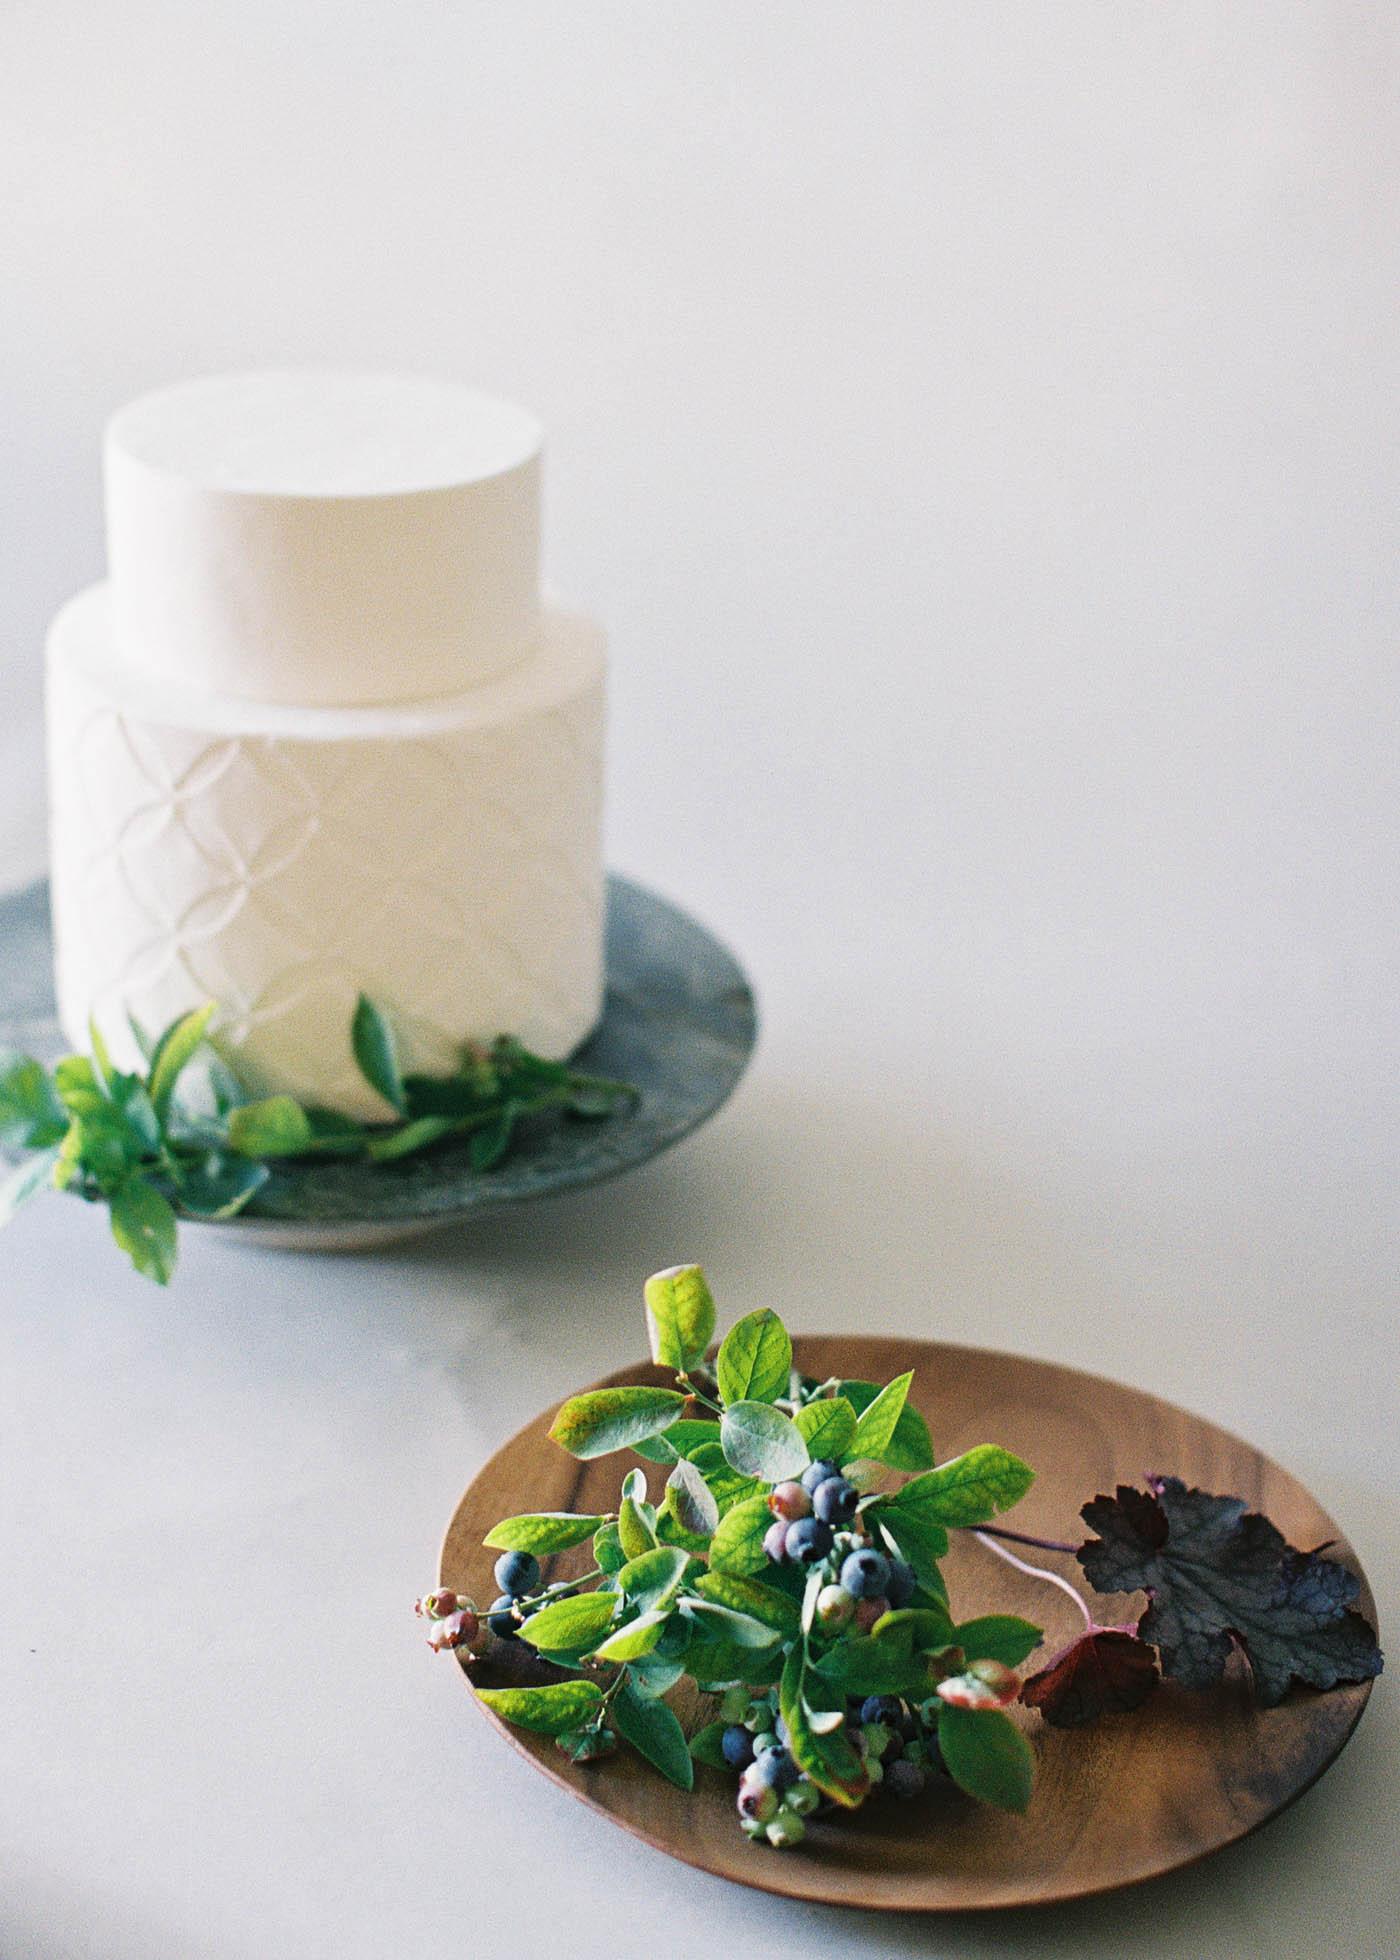 naturalist-cakes-1-Jen_Huang-000486-R1-005-1.jpg